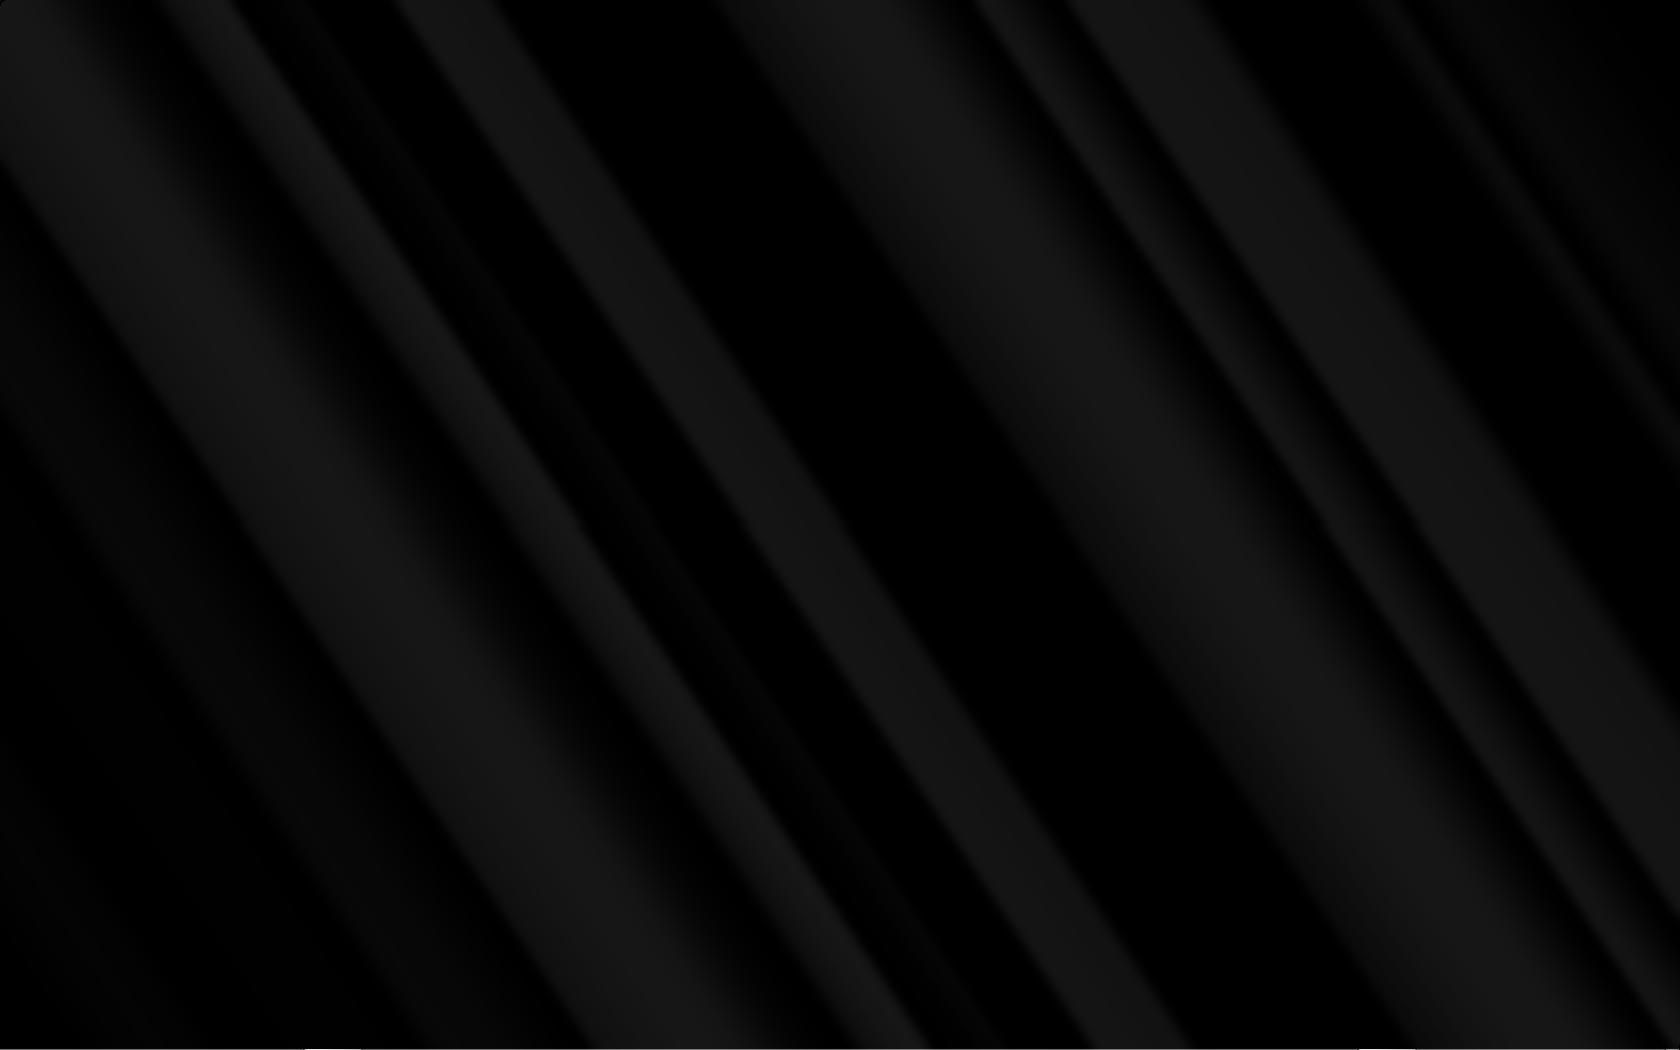 Hd plain black background wallpapers i desktop wallpaper plain black 1680x1050